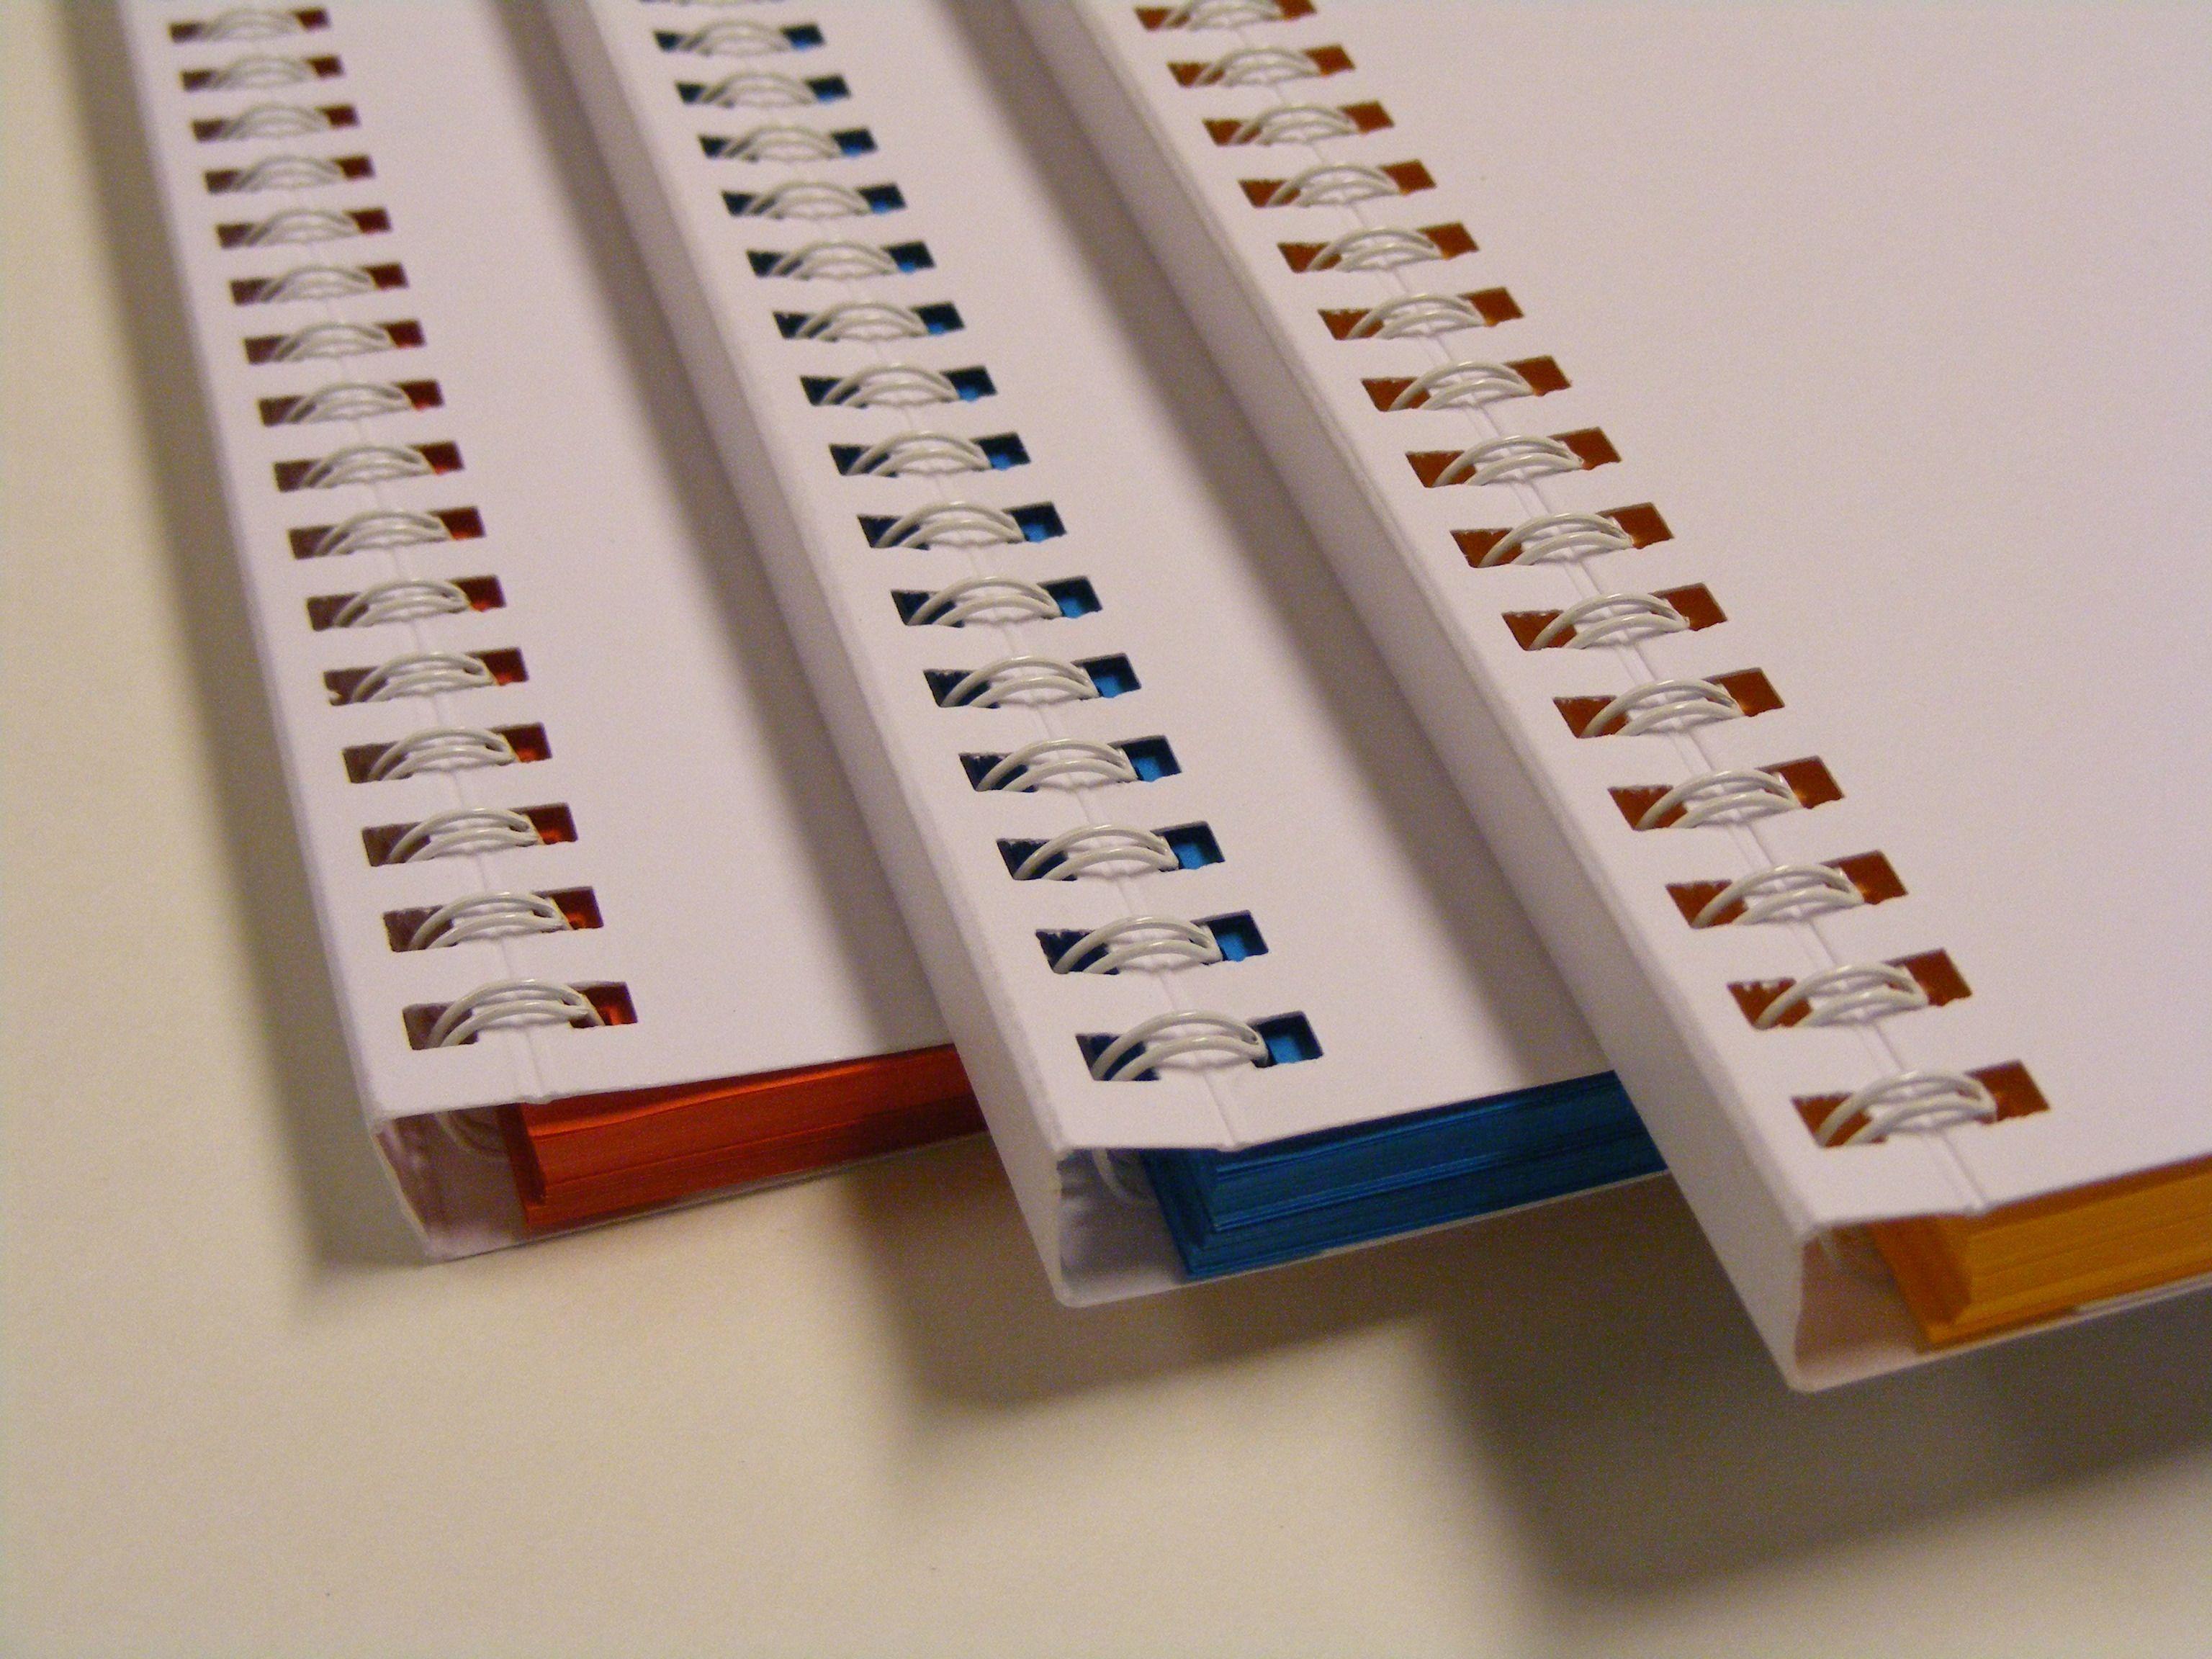 Wire O | Wire O Binding Brochures Met Half Verborgen Wire O Graphic